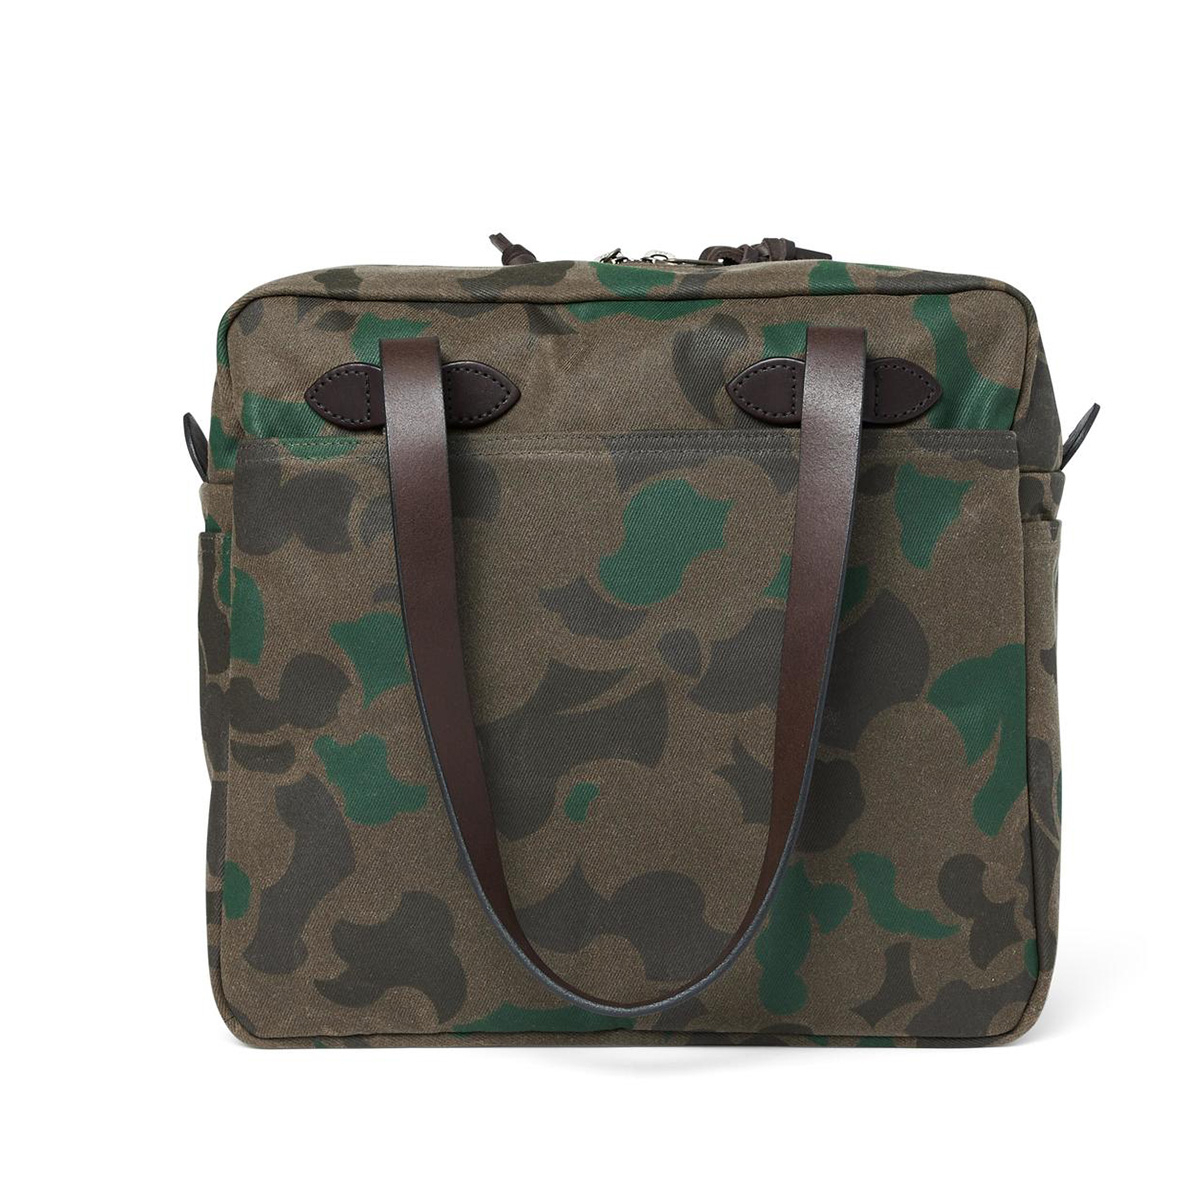 Filson Waxed Rugged Twill Tote Bag Zipper 20226931-Dark Wax Shrub Camo